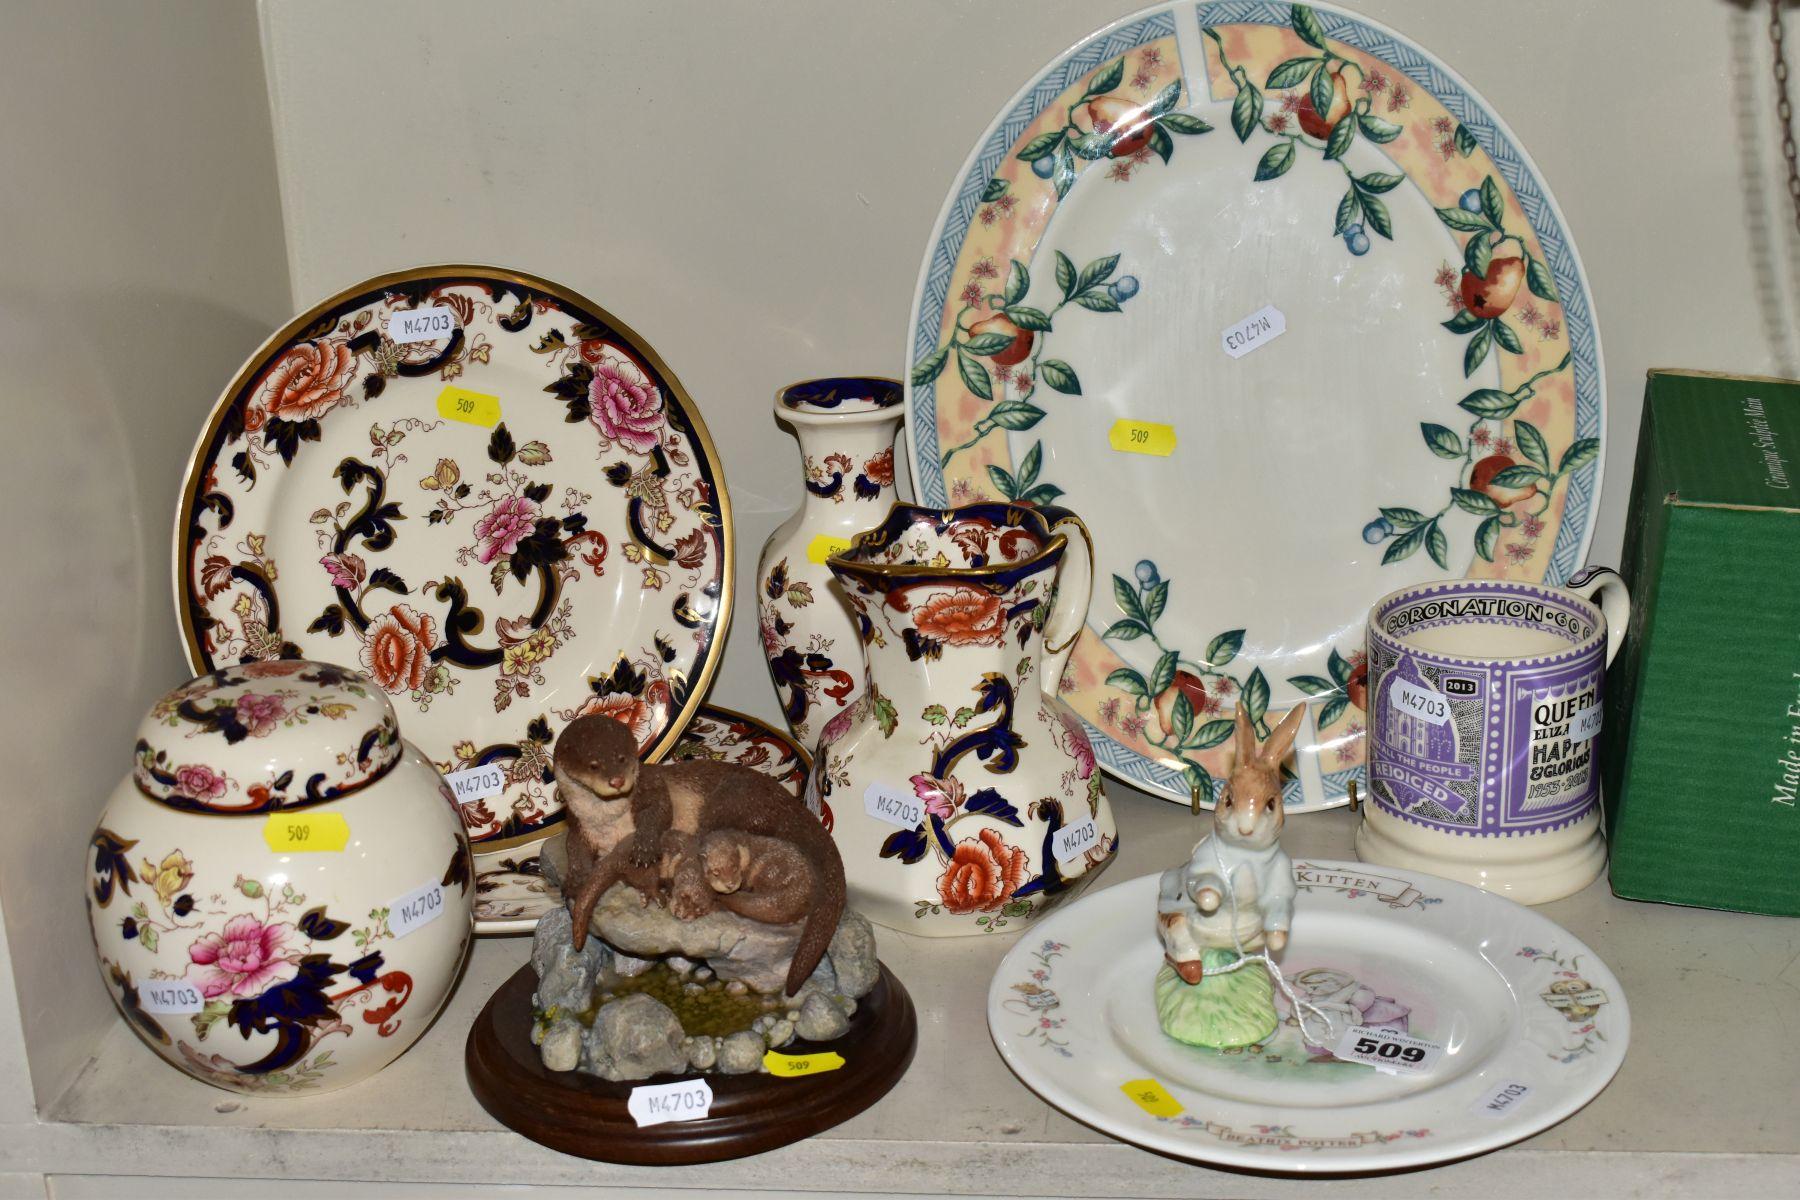 DECORATIVE CERAMICS ETC, to include a boxed Beswick Peter Rabbit, Royal Albert 'Tom Kitten' plate,